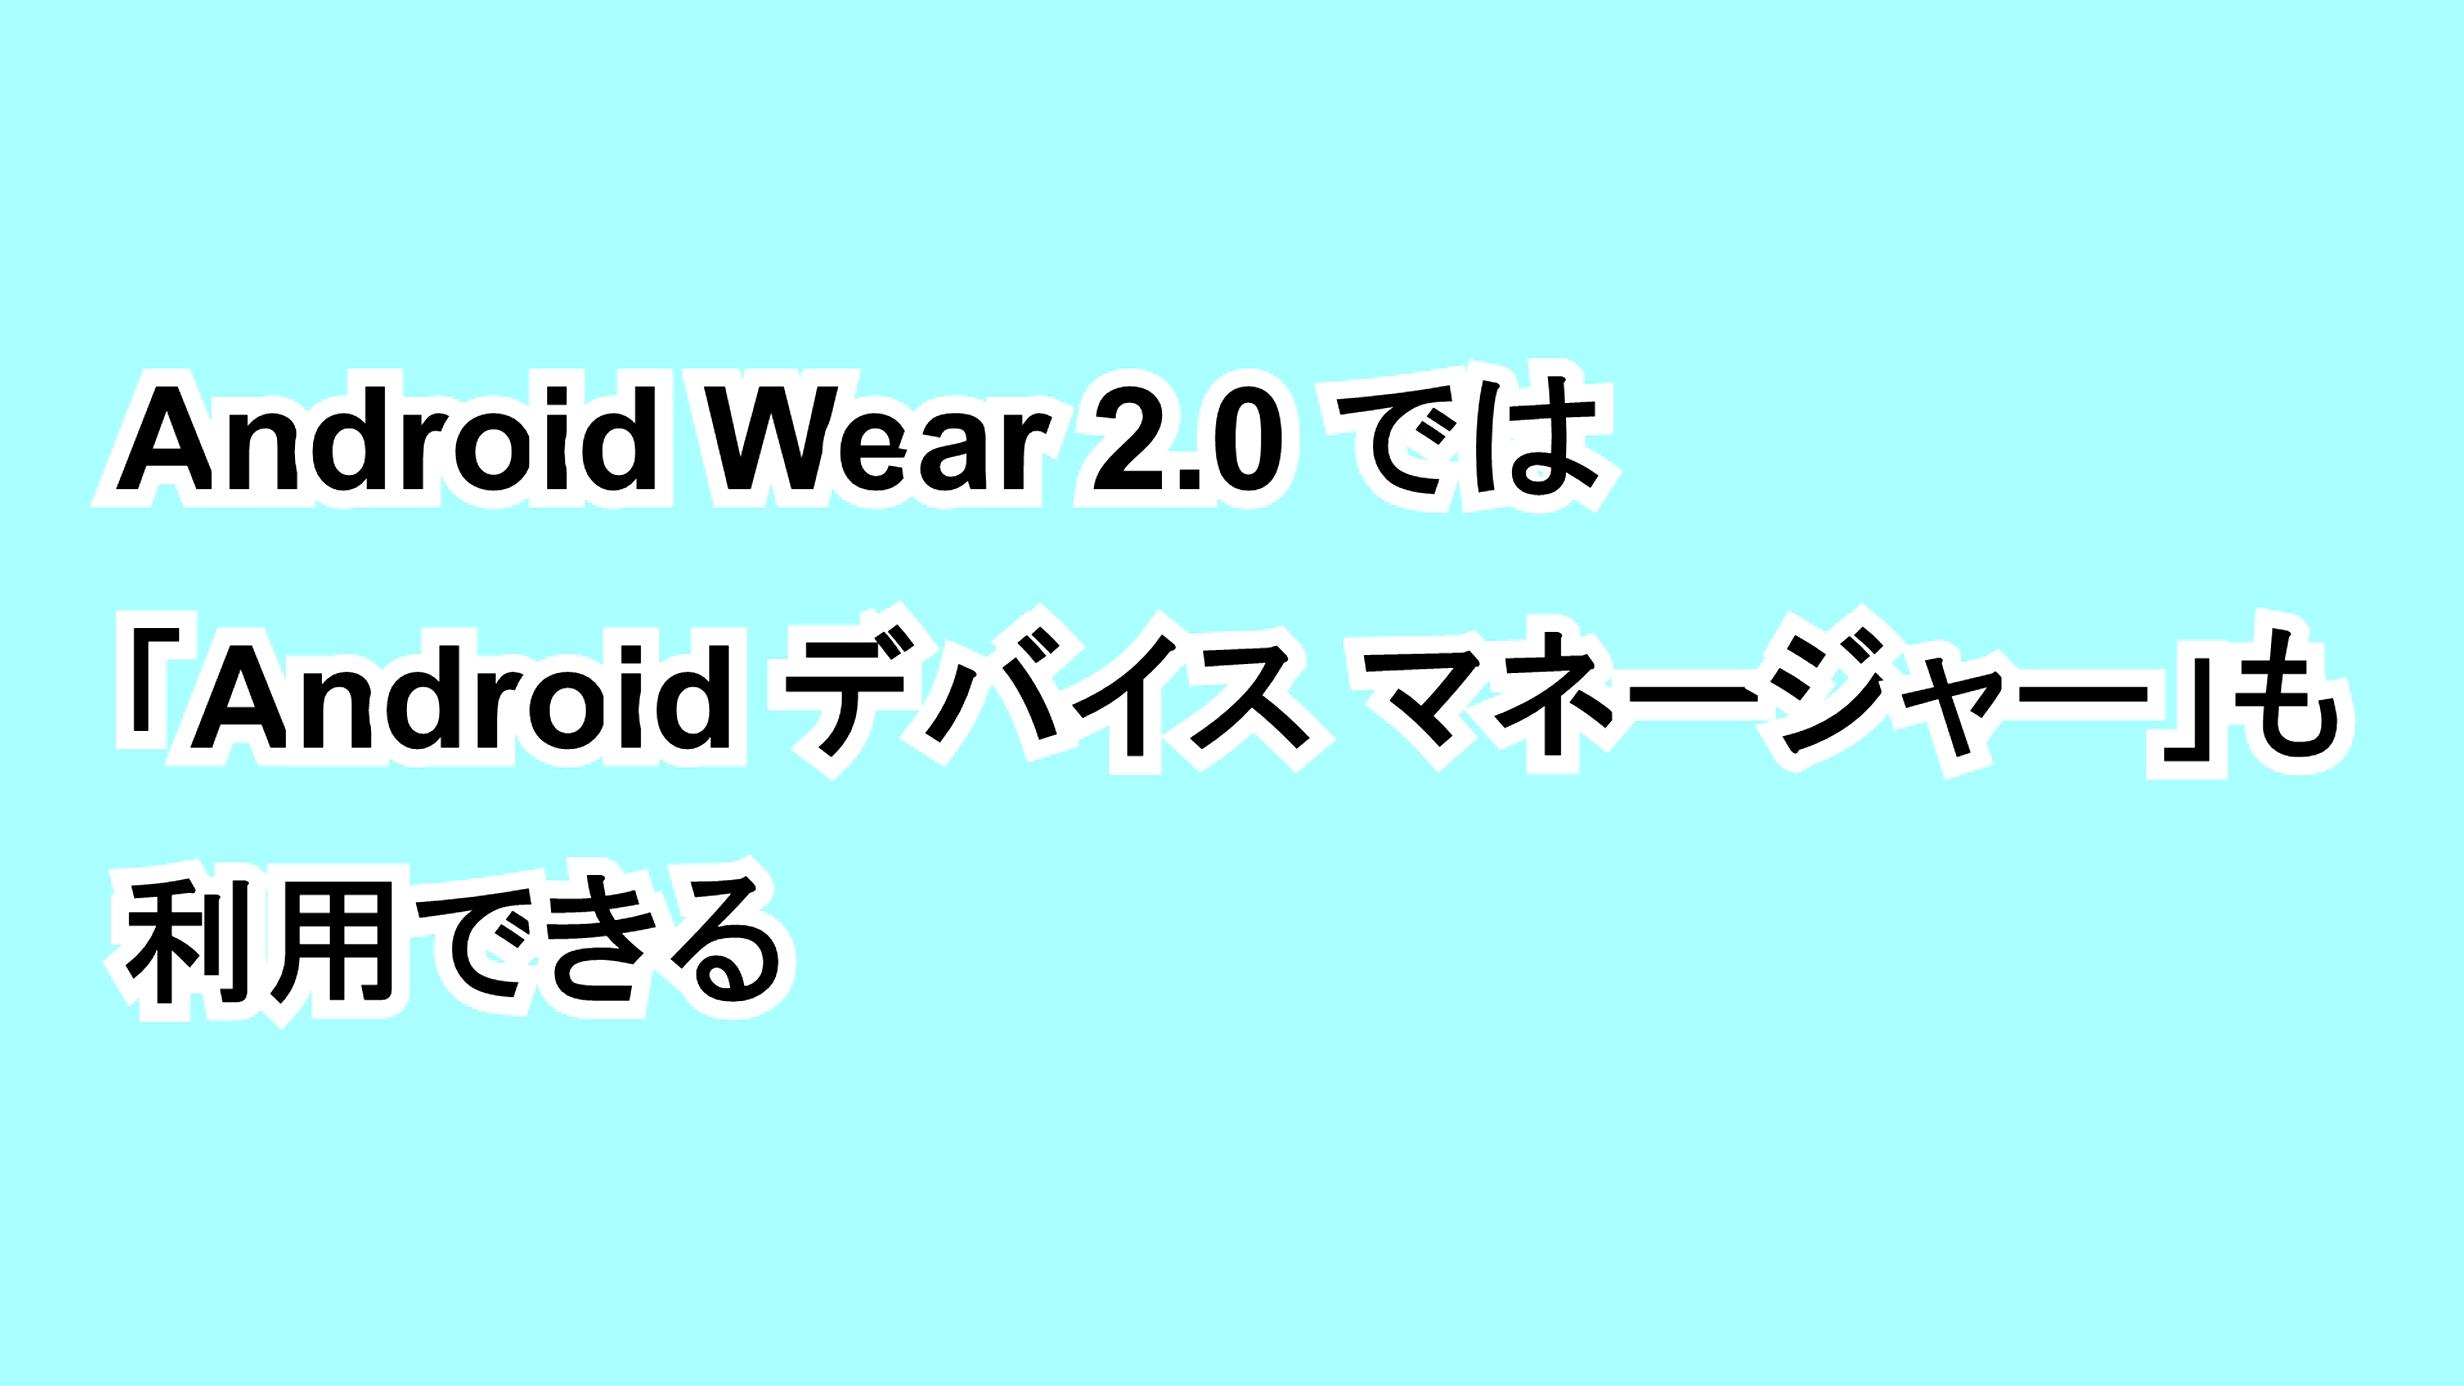 Android Wear 2.0では「Android デバイス マネージャー」も利用できる